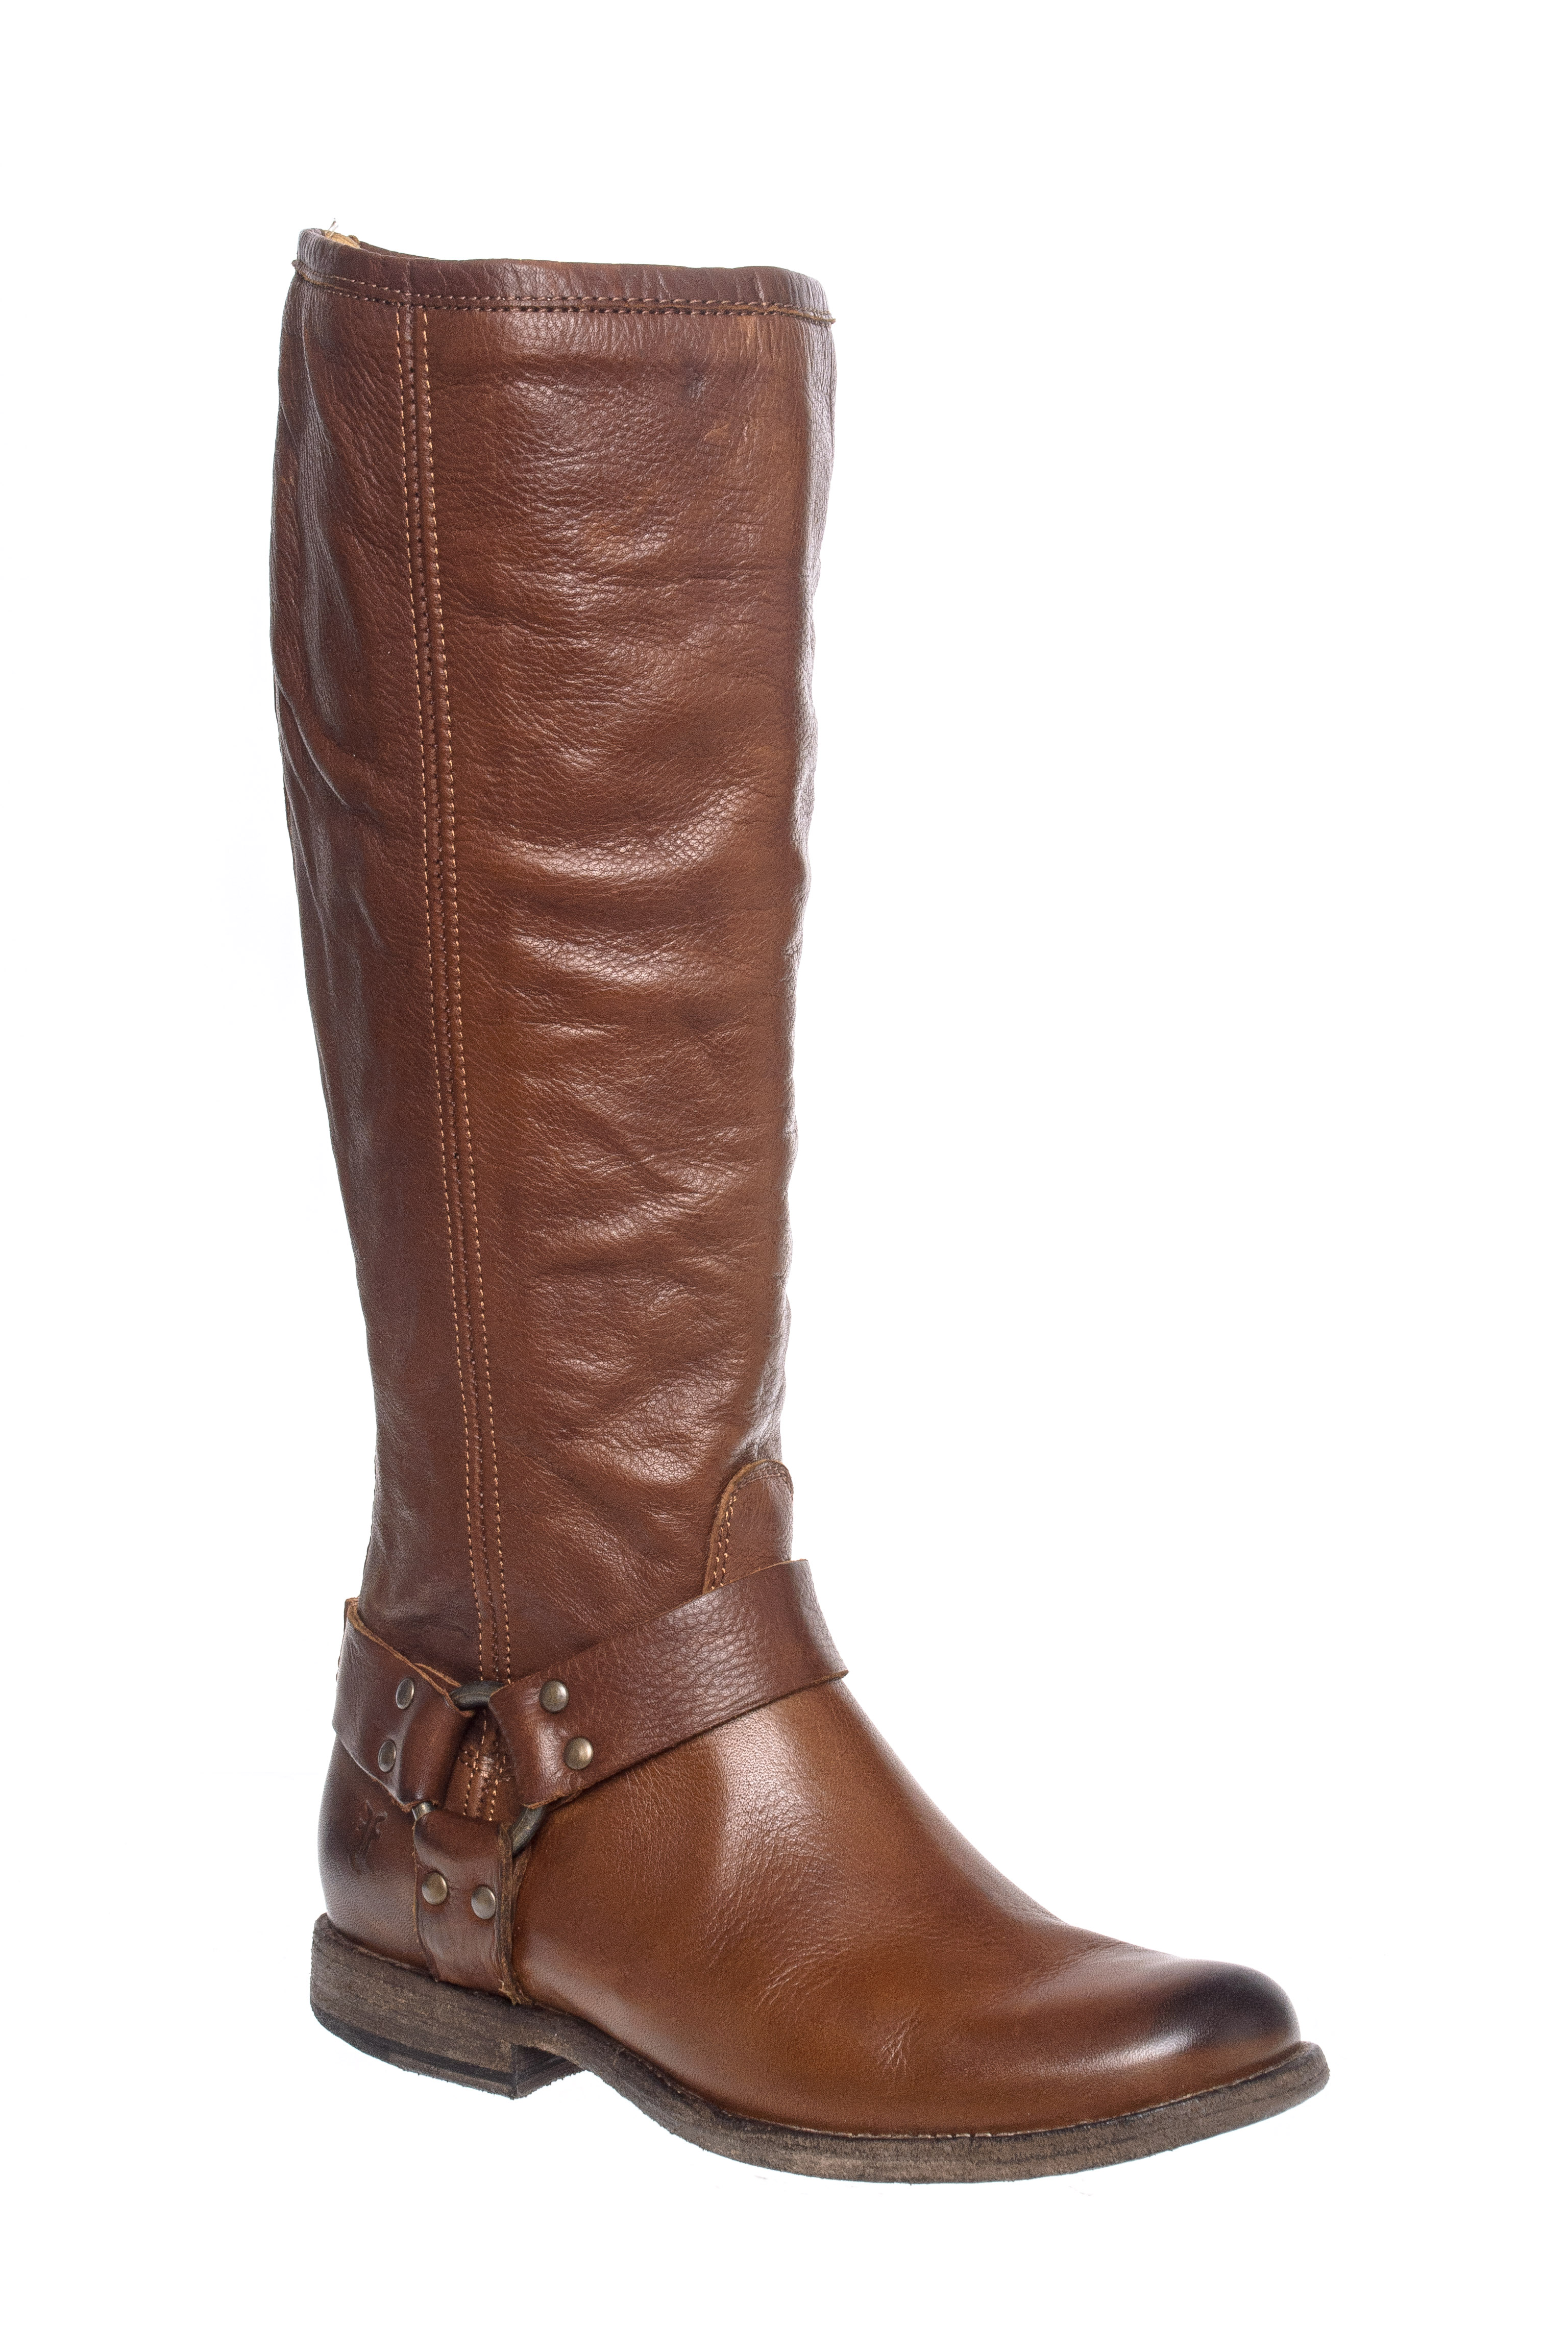 Frye Phillip Harness Tall Boots - Cognac